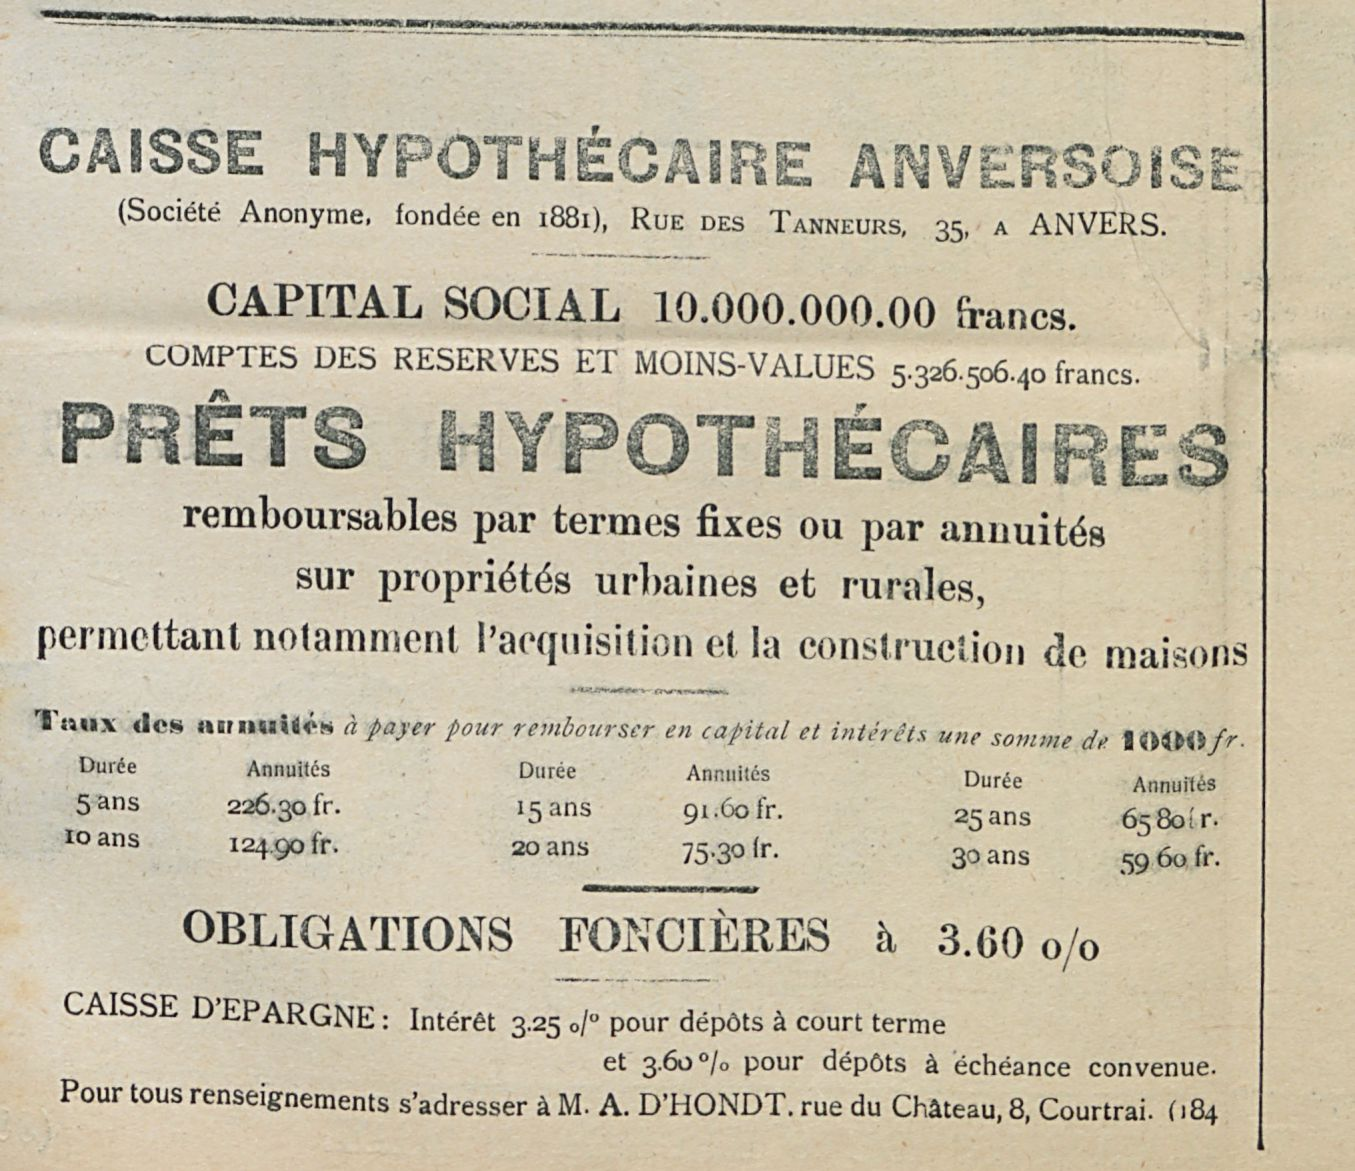 CAISSE HYPOTHECAIRE ANVERSOISE